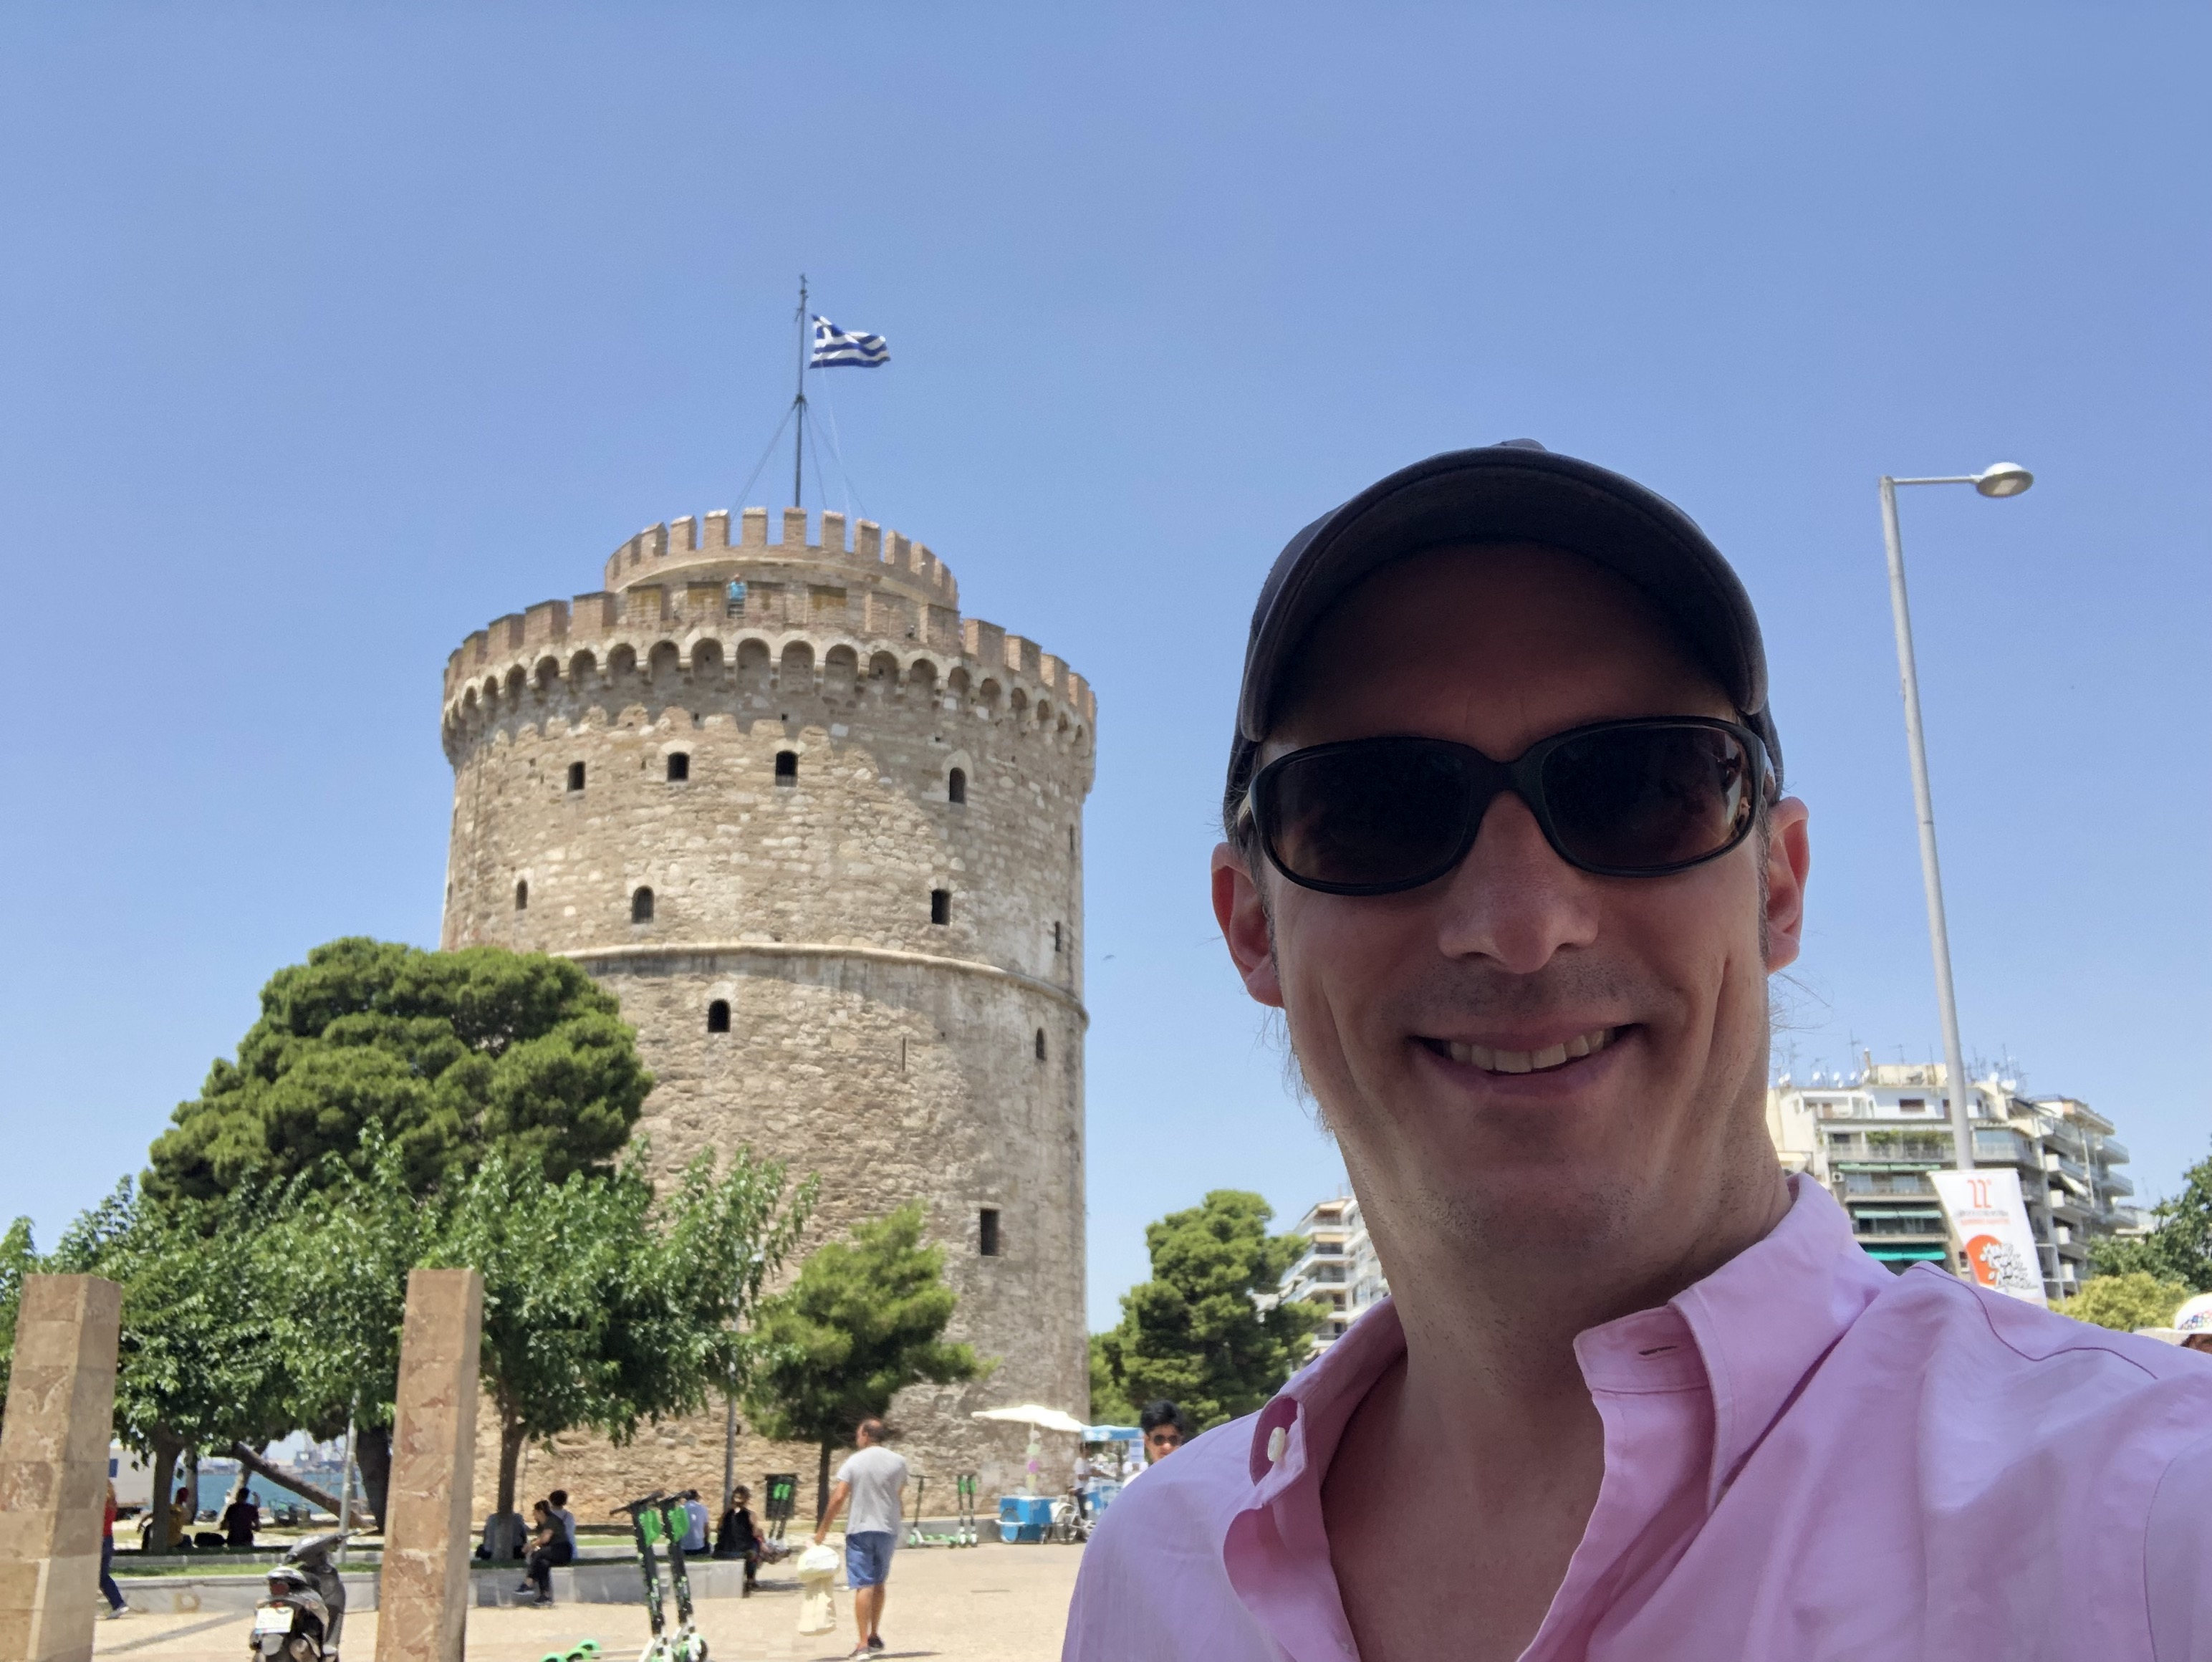 Ankunft in Griechenland, 36 Grad